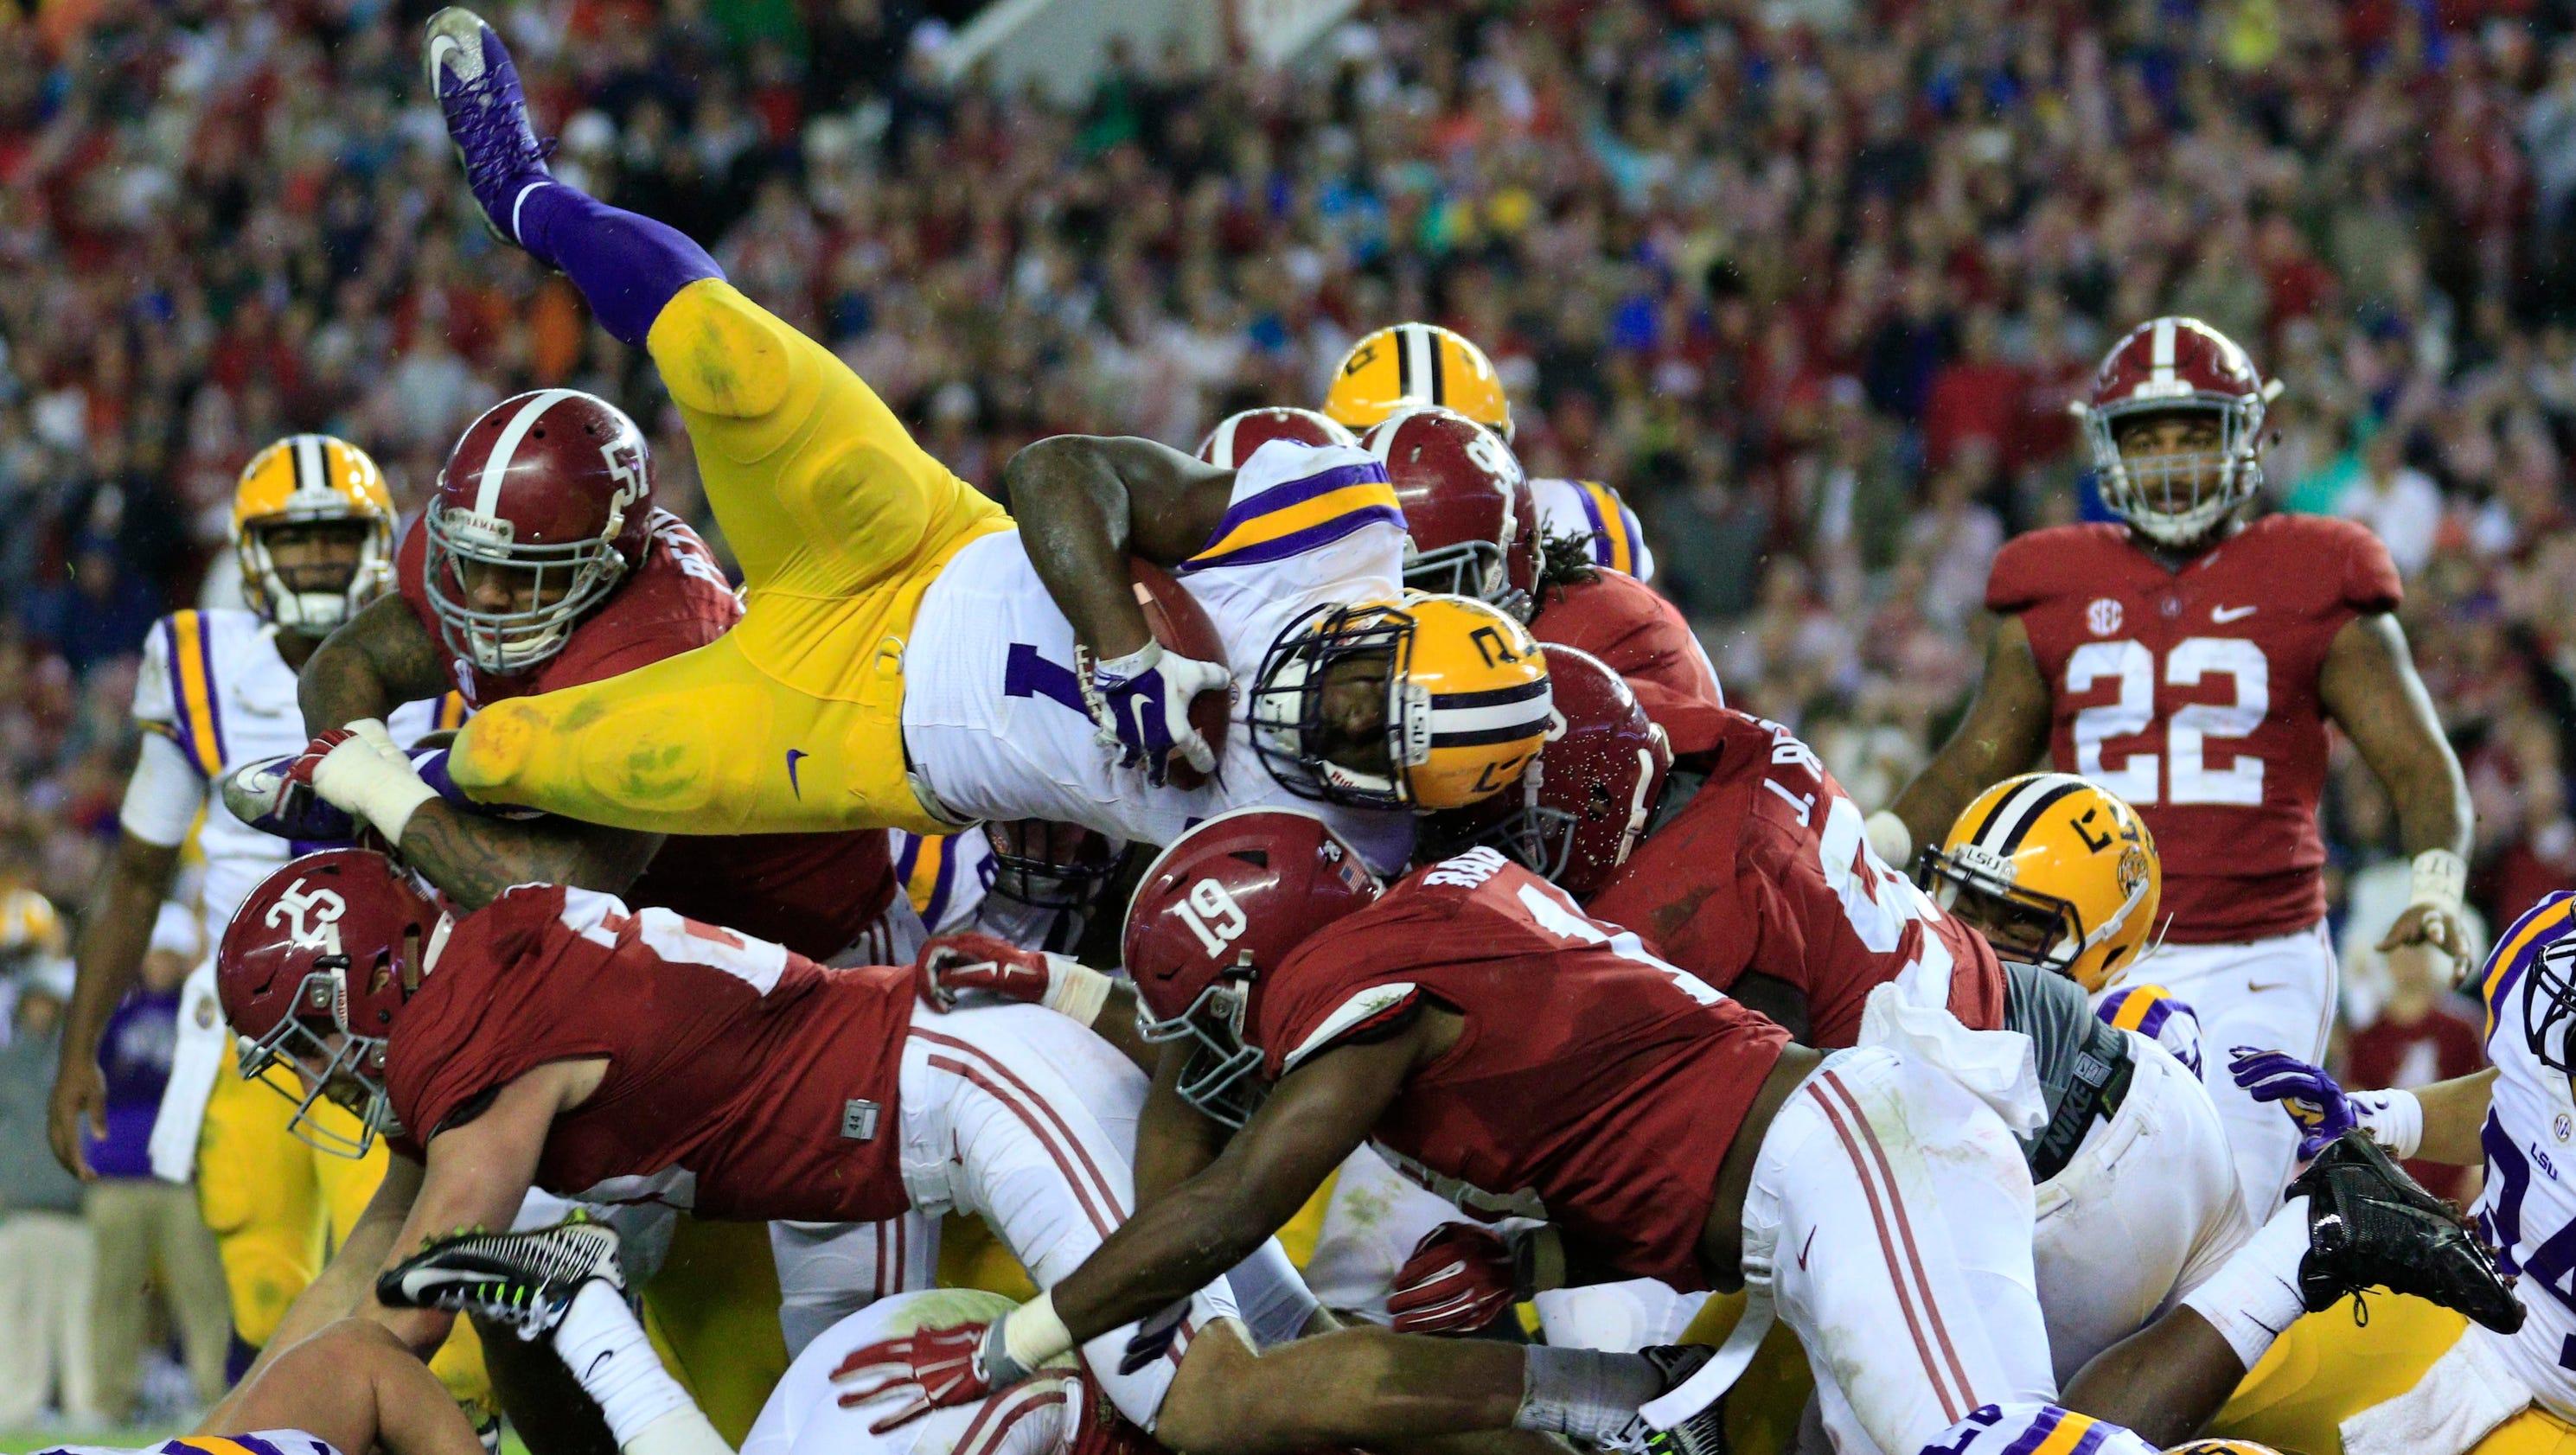 alabama lsu football sports college usa today tigers leonard tide fournette crimson staff prediction defense picks gentry marvin al roundtable